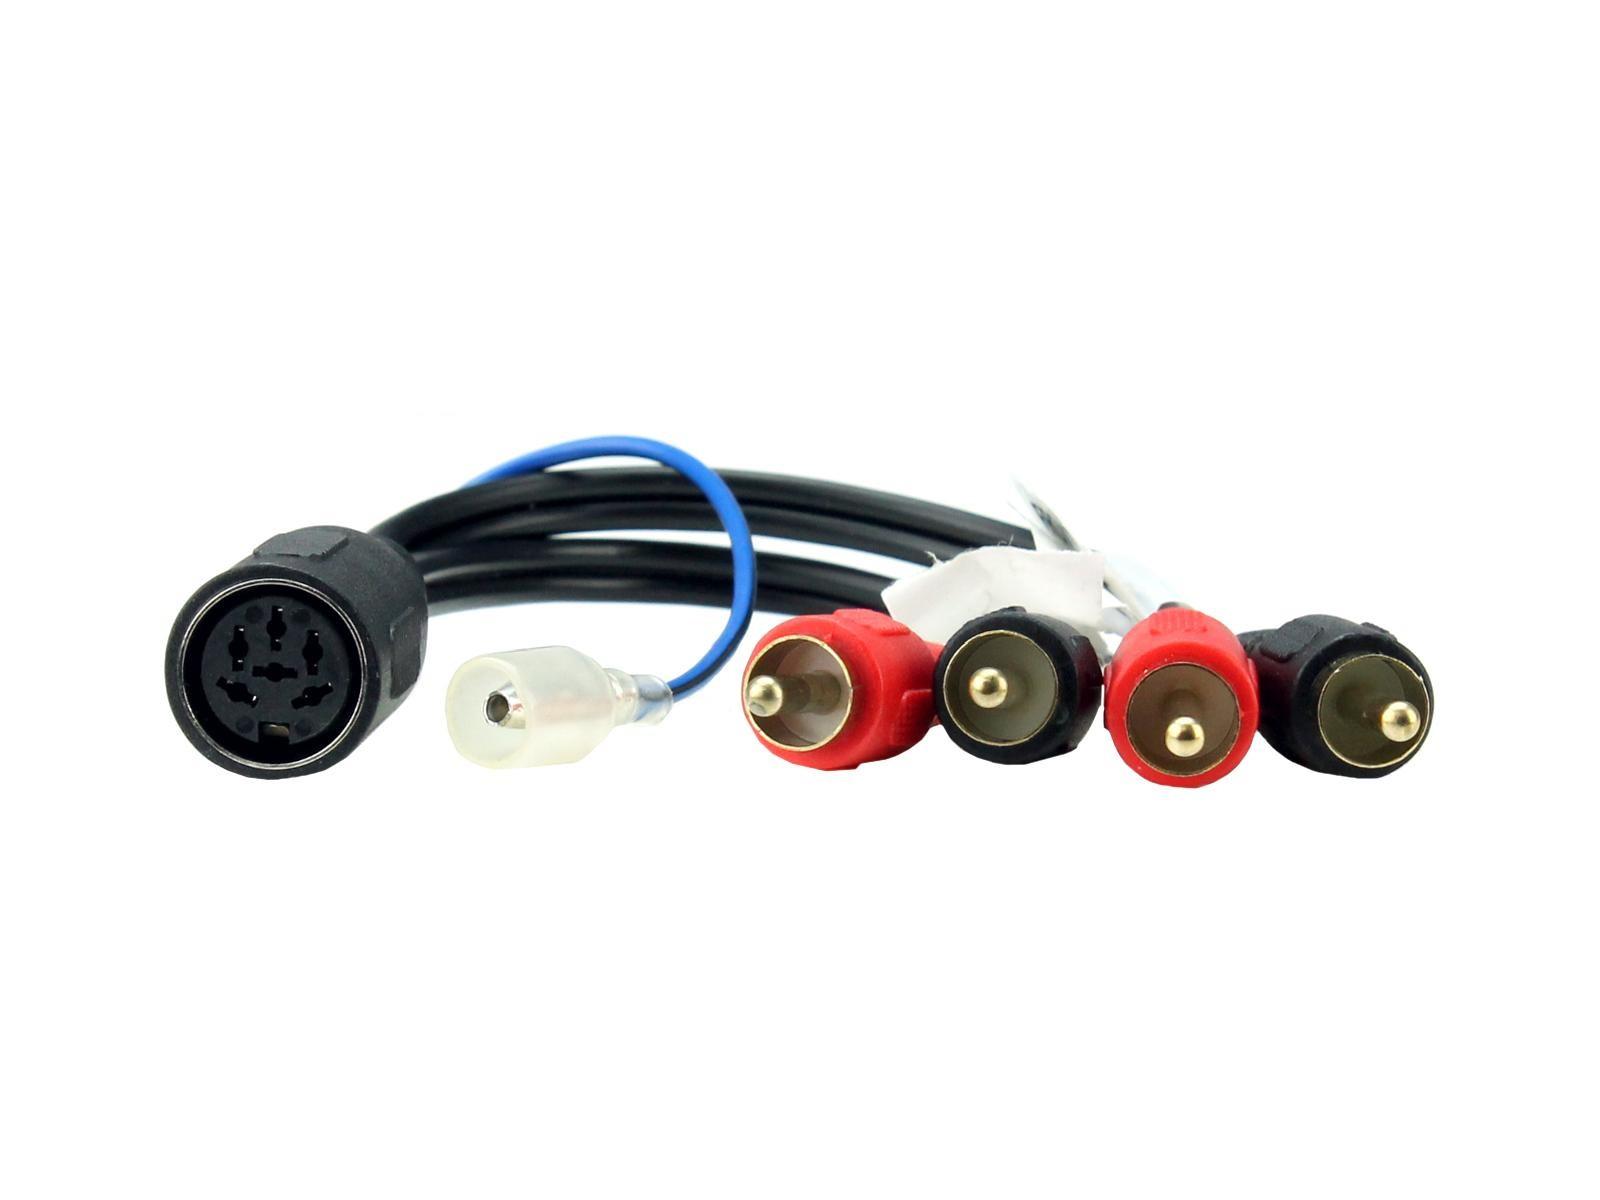 Amplifier retention oem naar RCA Volvo S70/S80/V70